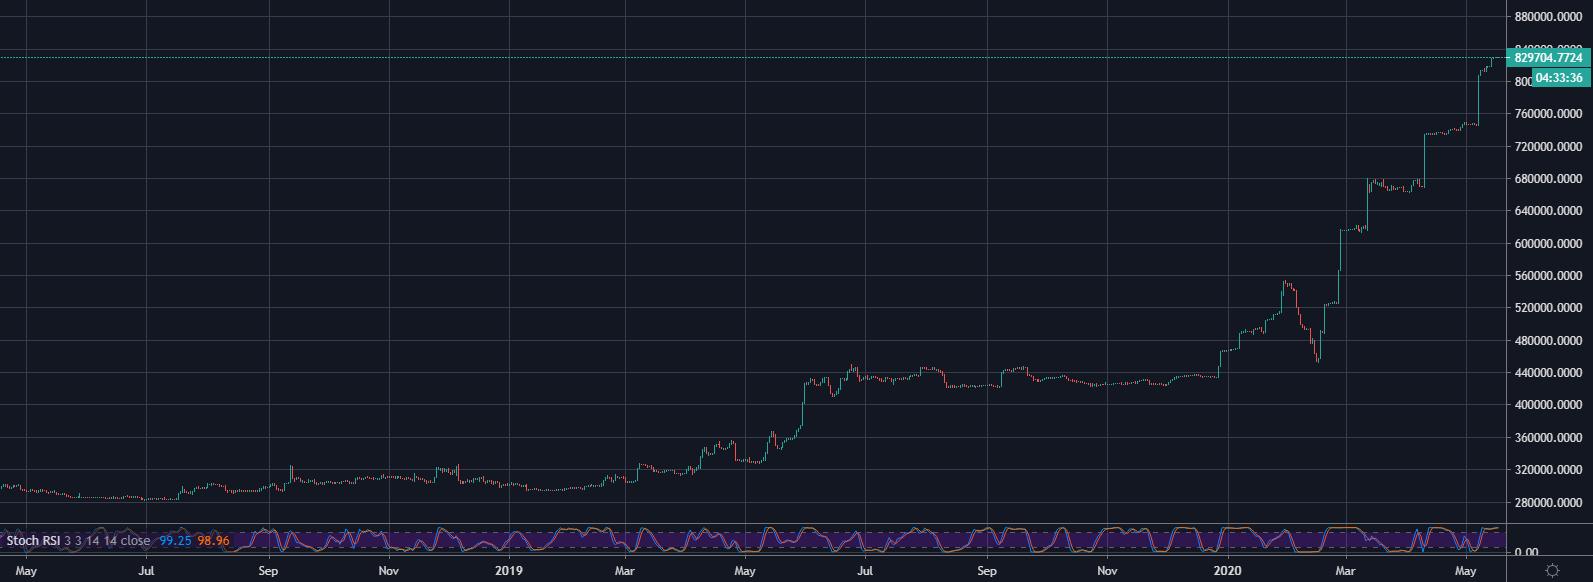 Bitfinex ETH/BTC Longs 1D May 2019 - May 2020: TradingView